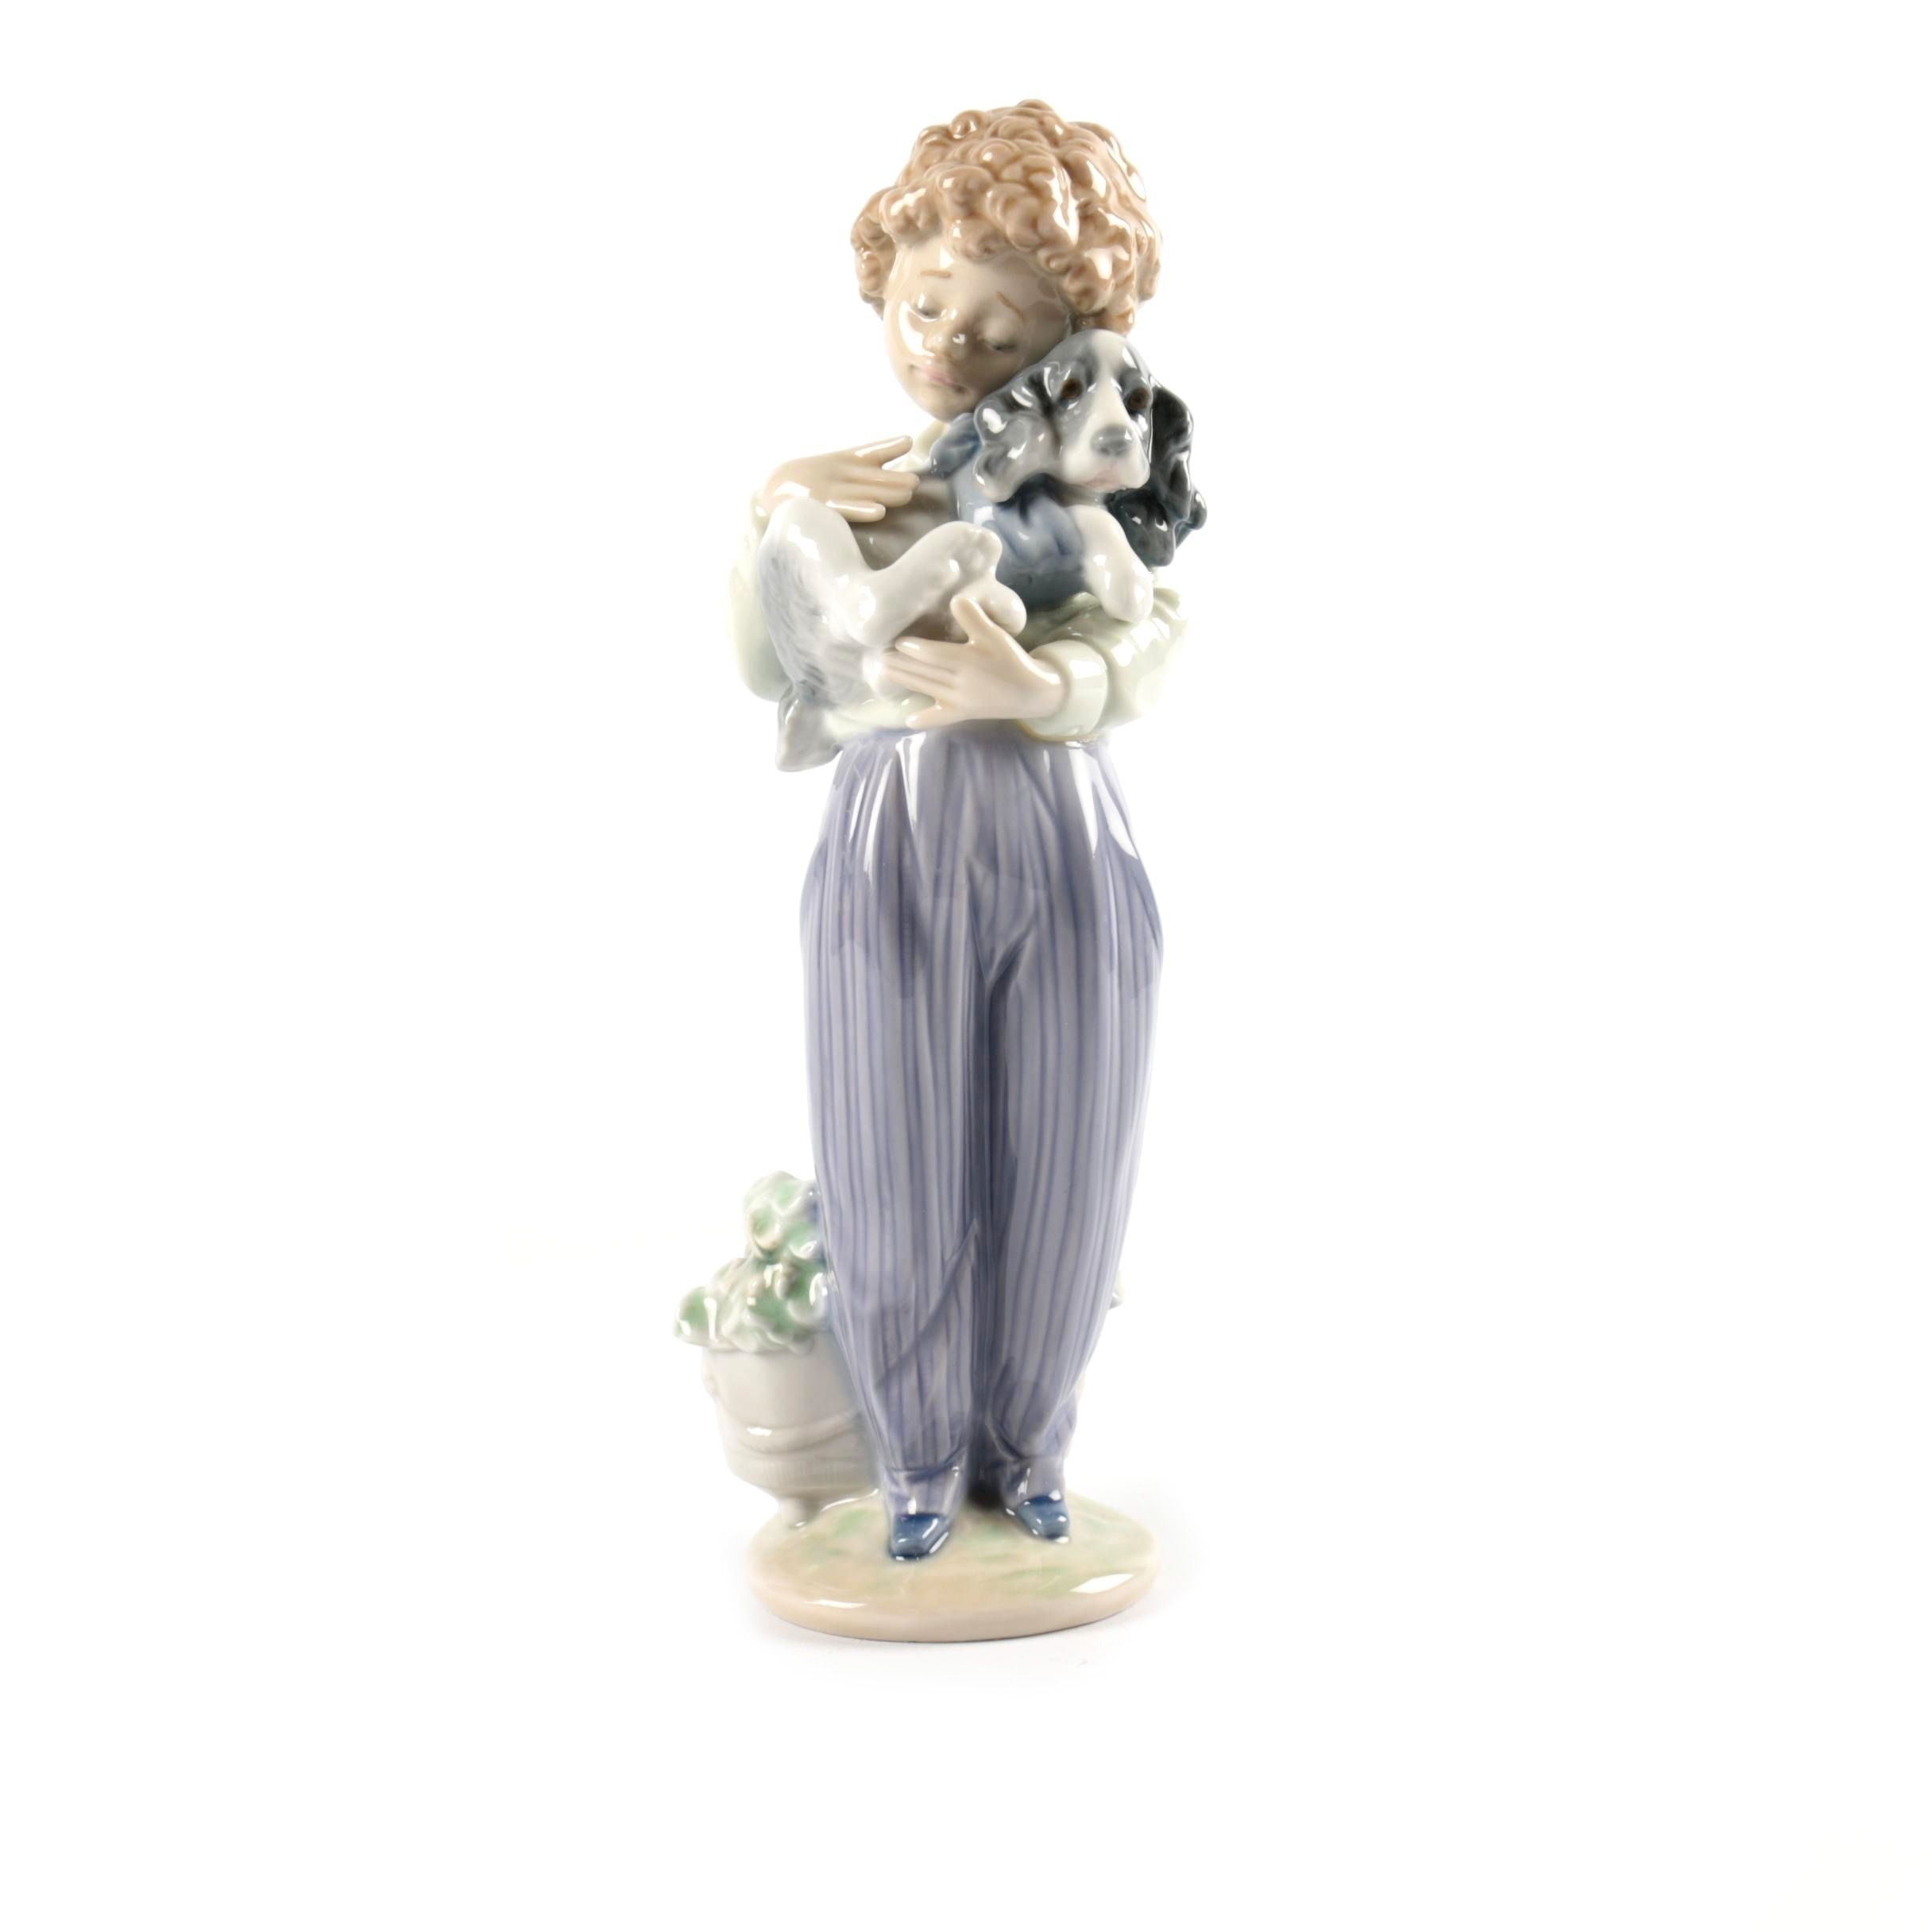 "Lladró ""My Buddy"" Porcelain Figurine"